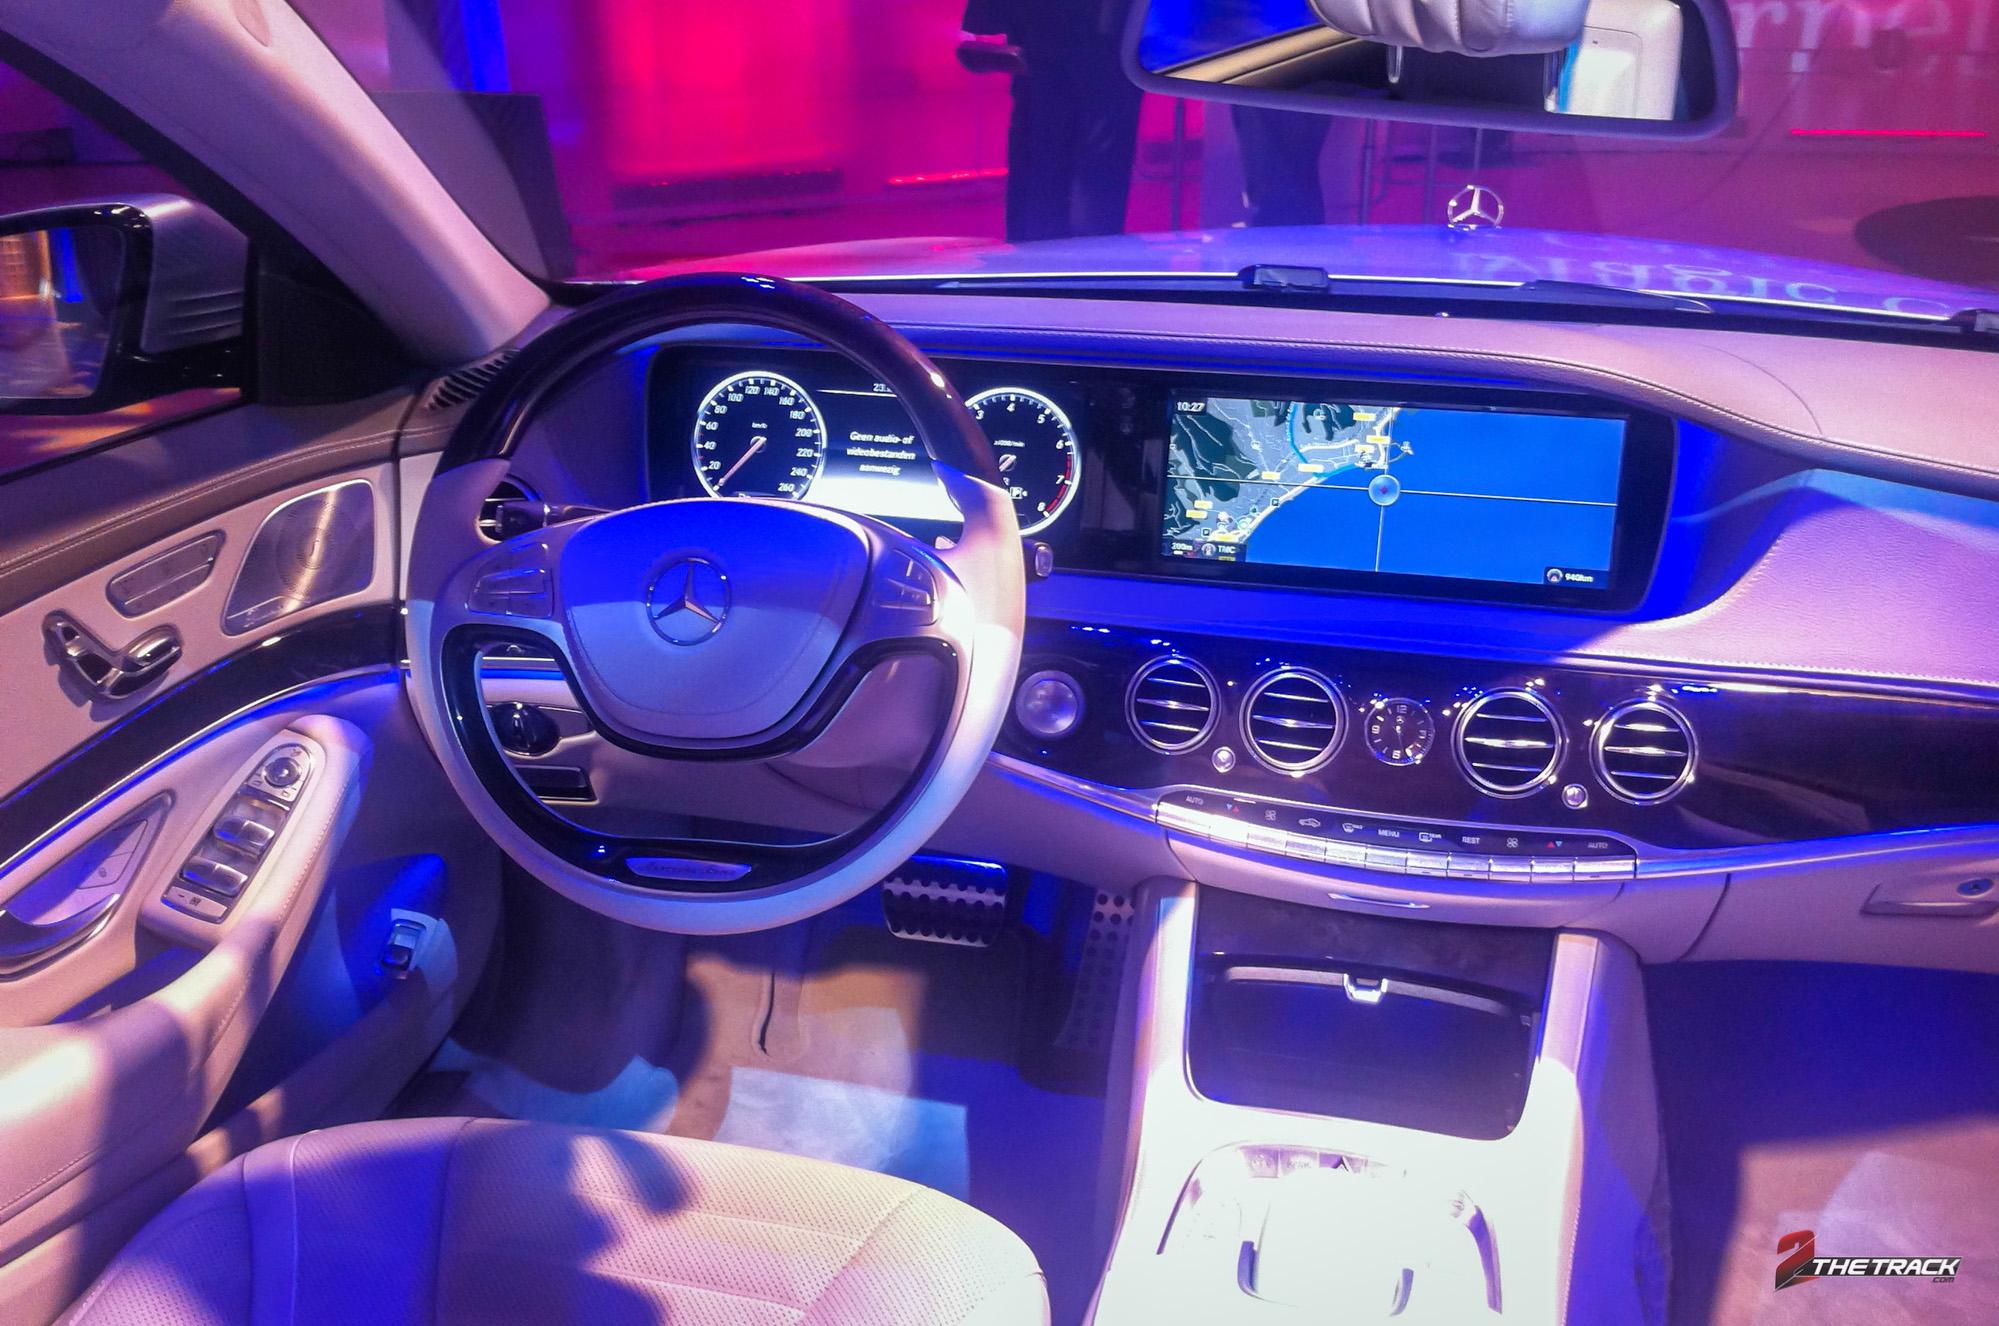 2014-Mercedes-Benz-S-klasse-1-9